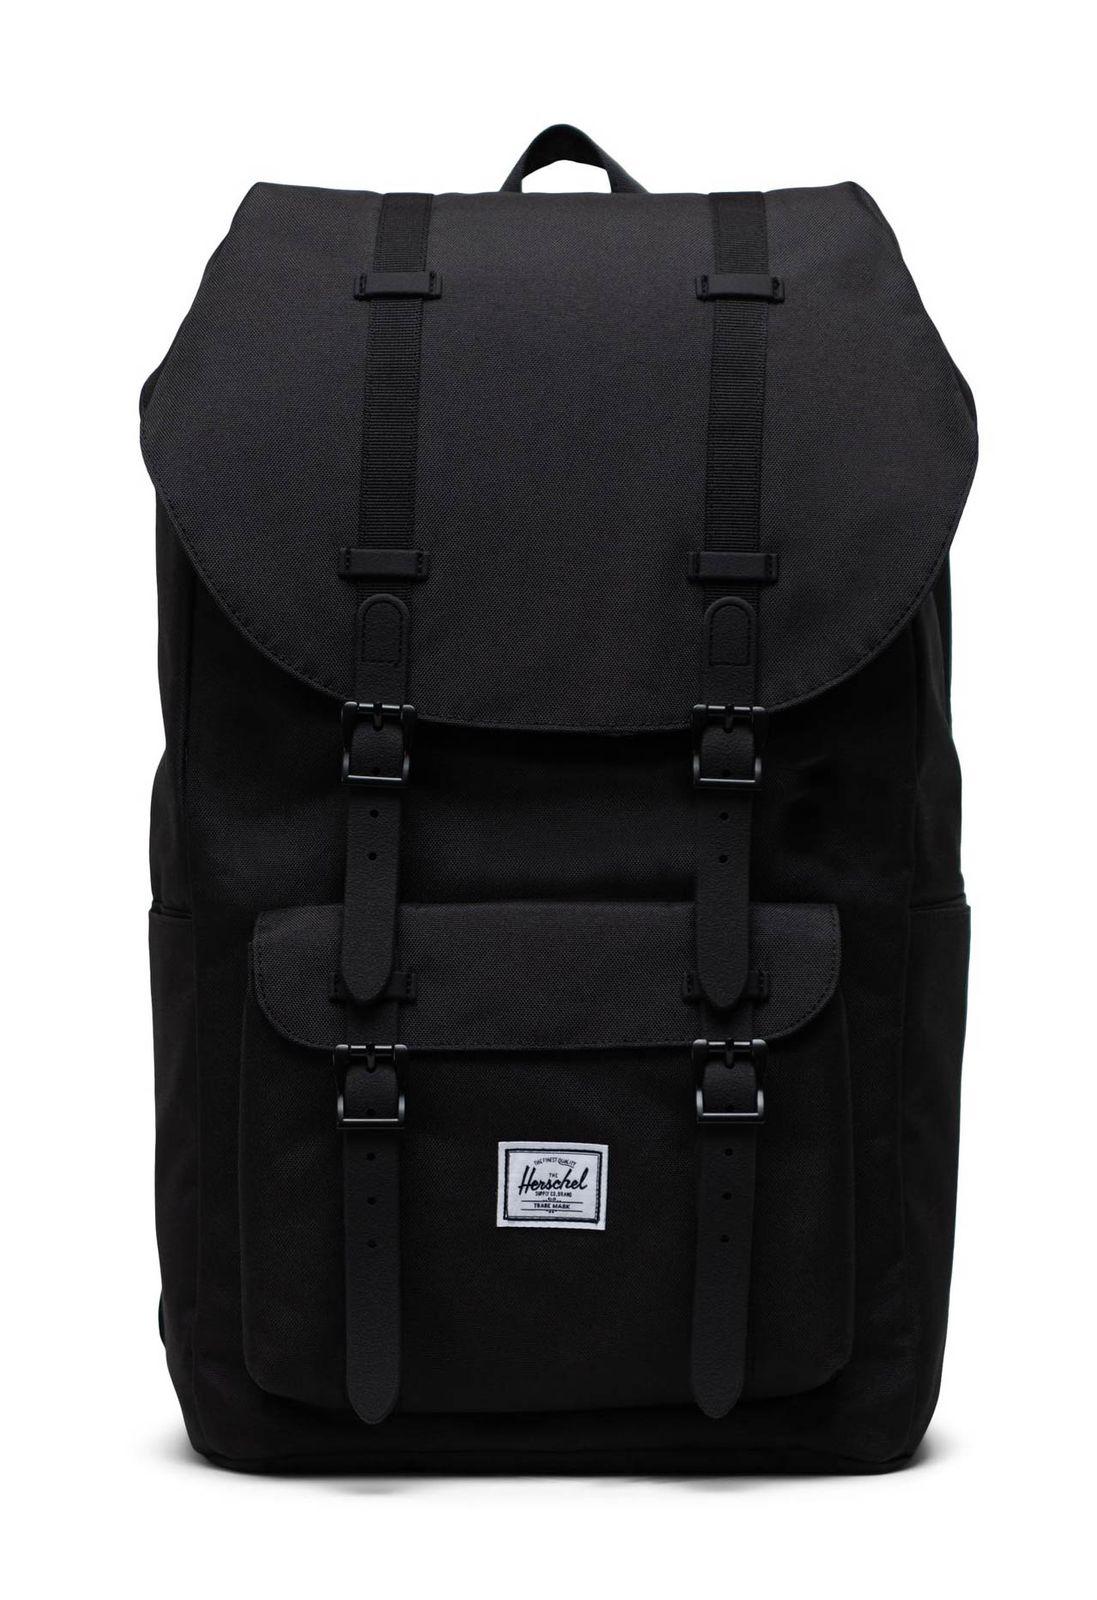 Herschel Eco Little America Backpack Black / Black